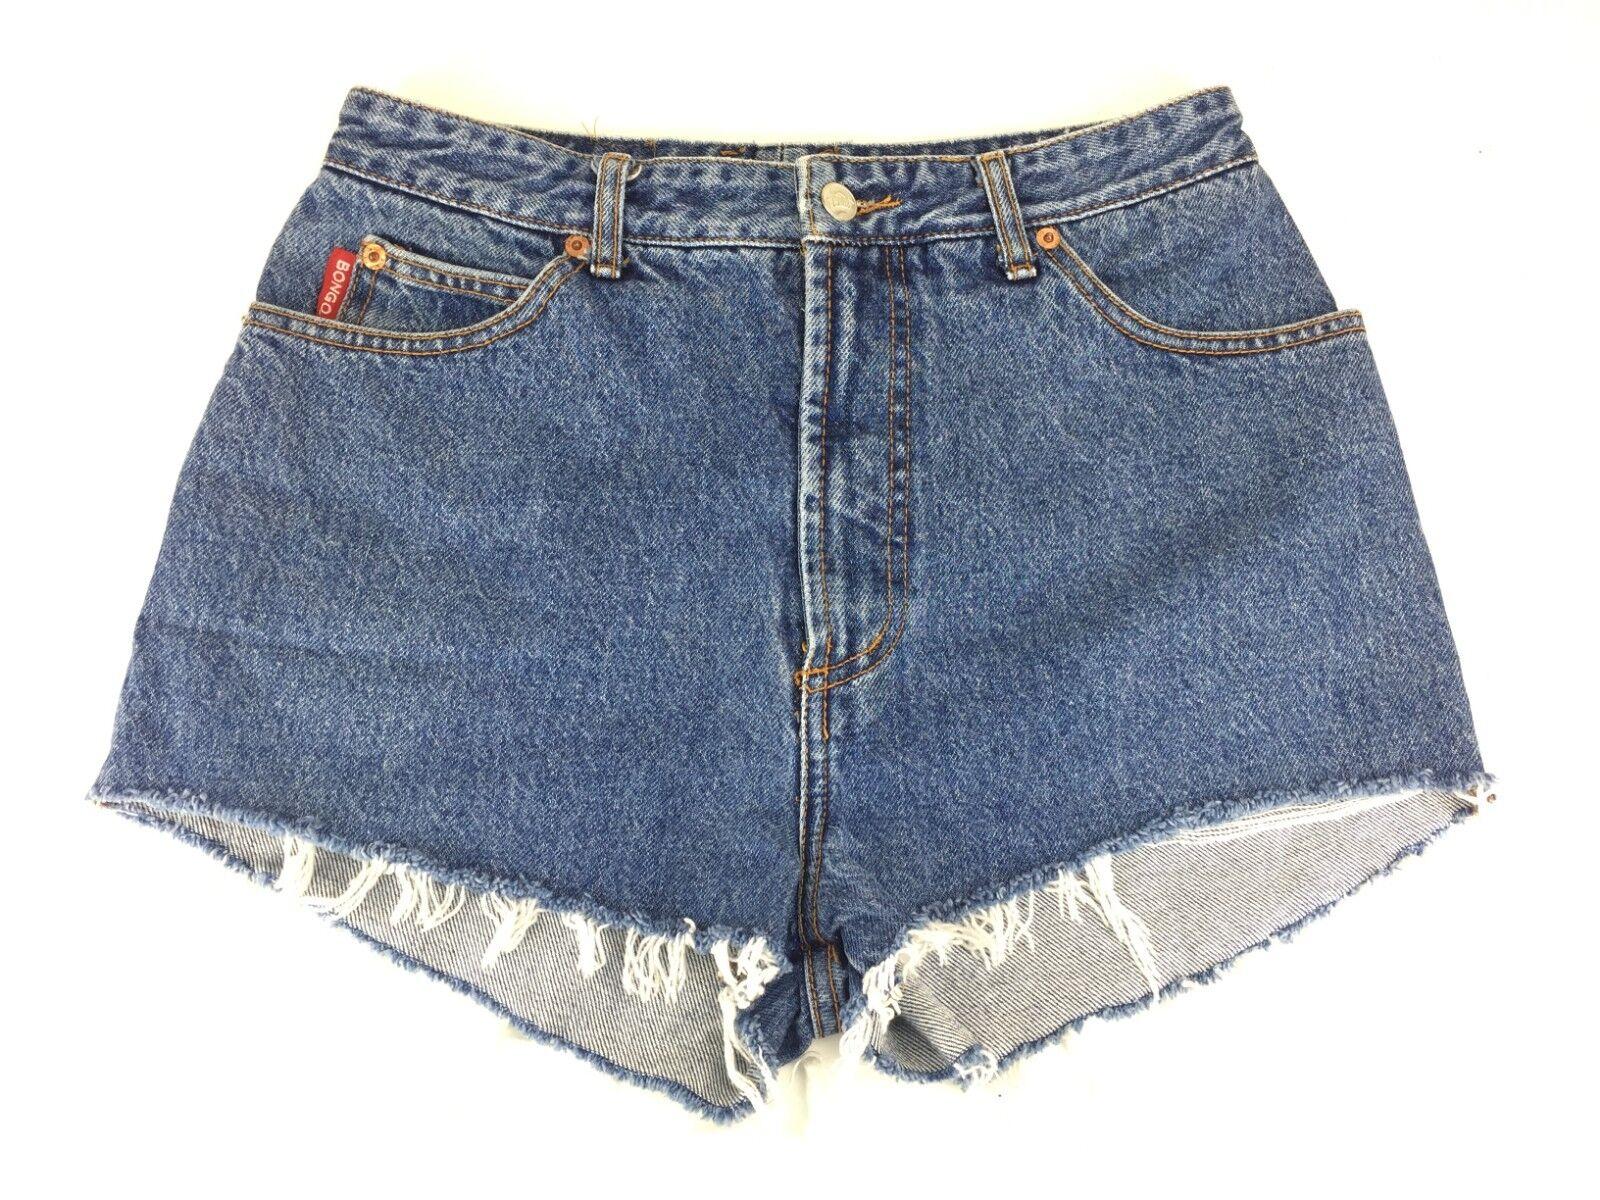 Vintage Bongo Jr's 13 Denim Shorts bluee